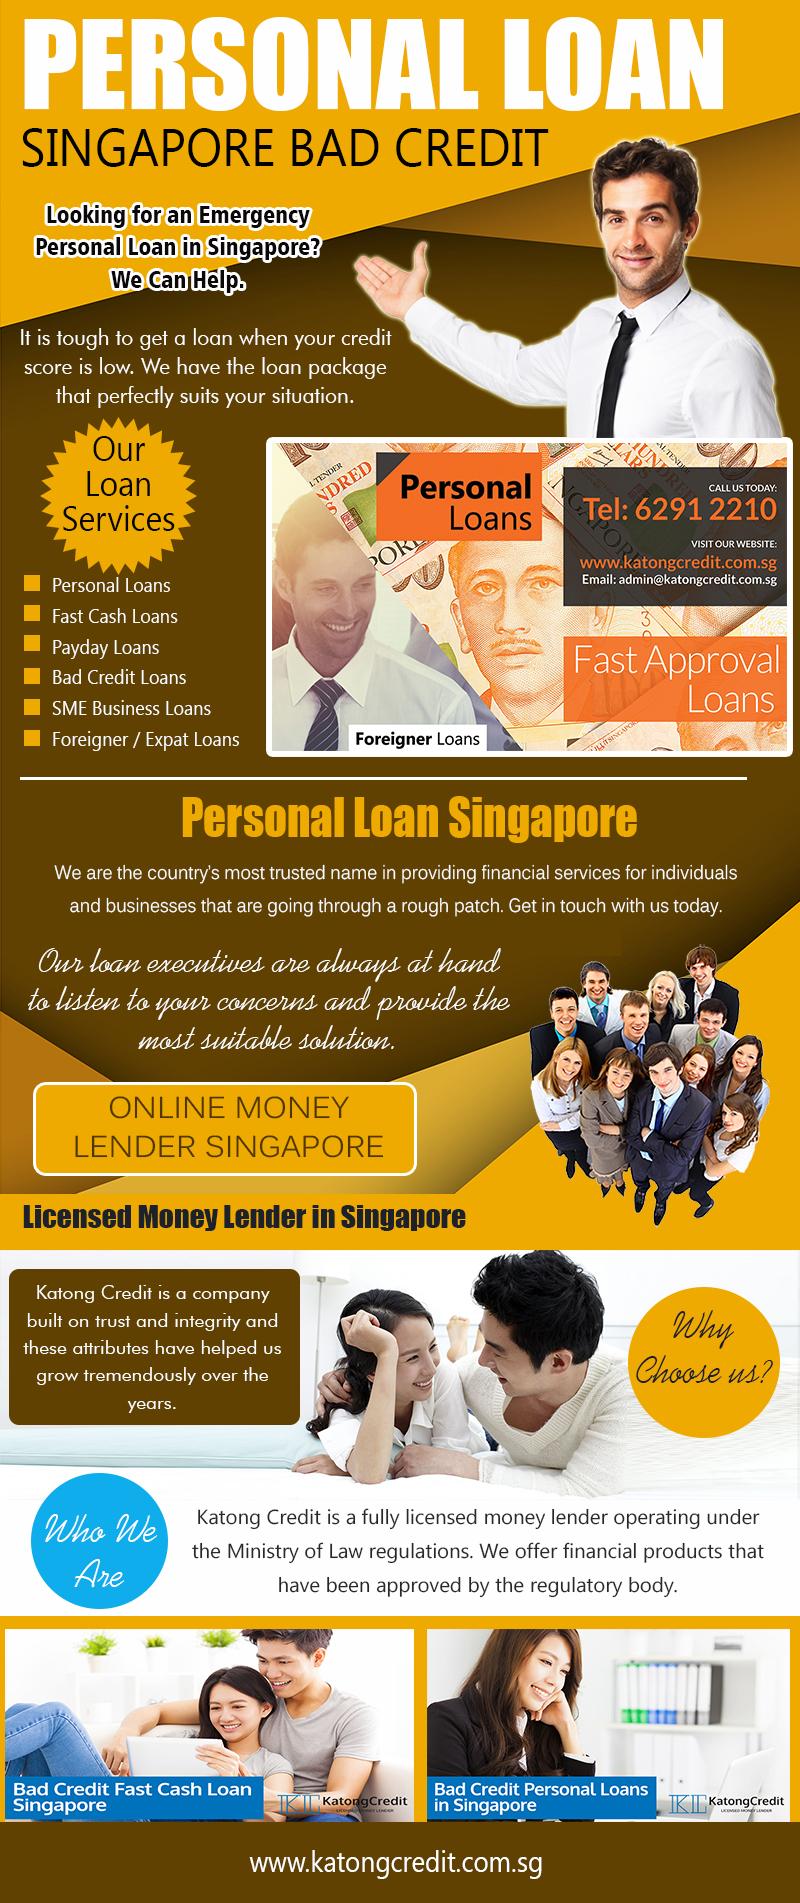 moneylender Singapore | https://www.katongcredit.com.sg/apply-for-a-loan/